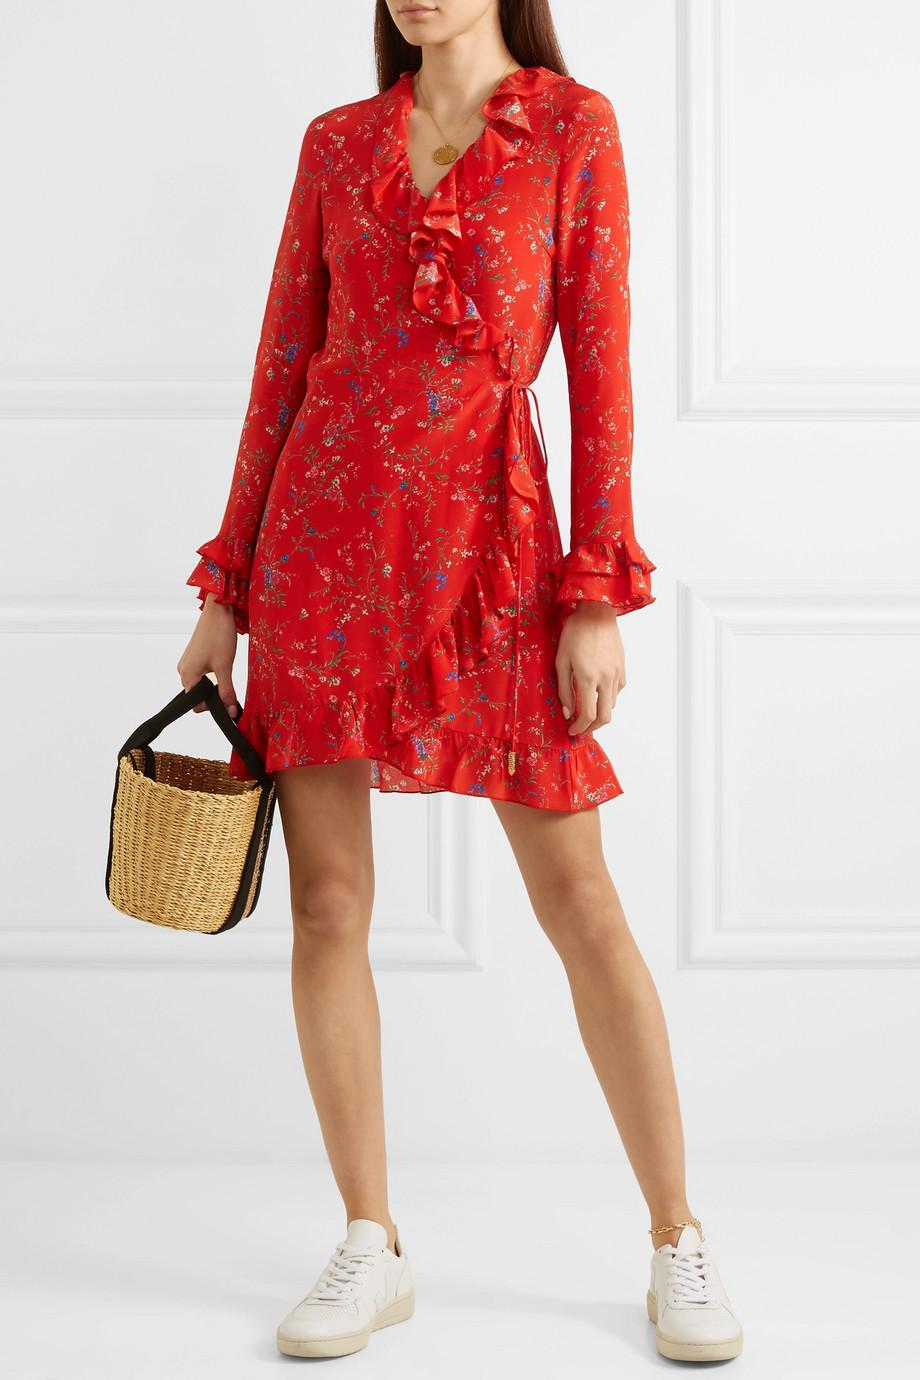 Fiesta Ruffled Floral-print Silk Wrap Dress - Red Paloma Blue RkO5NhO9il